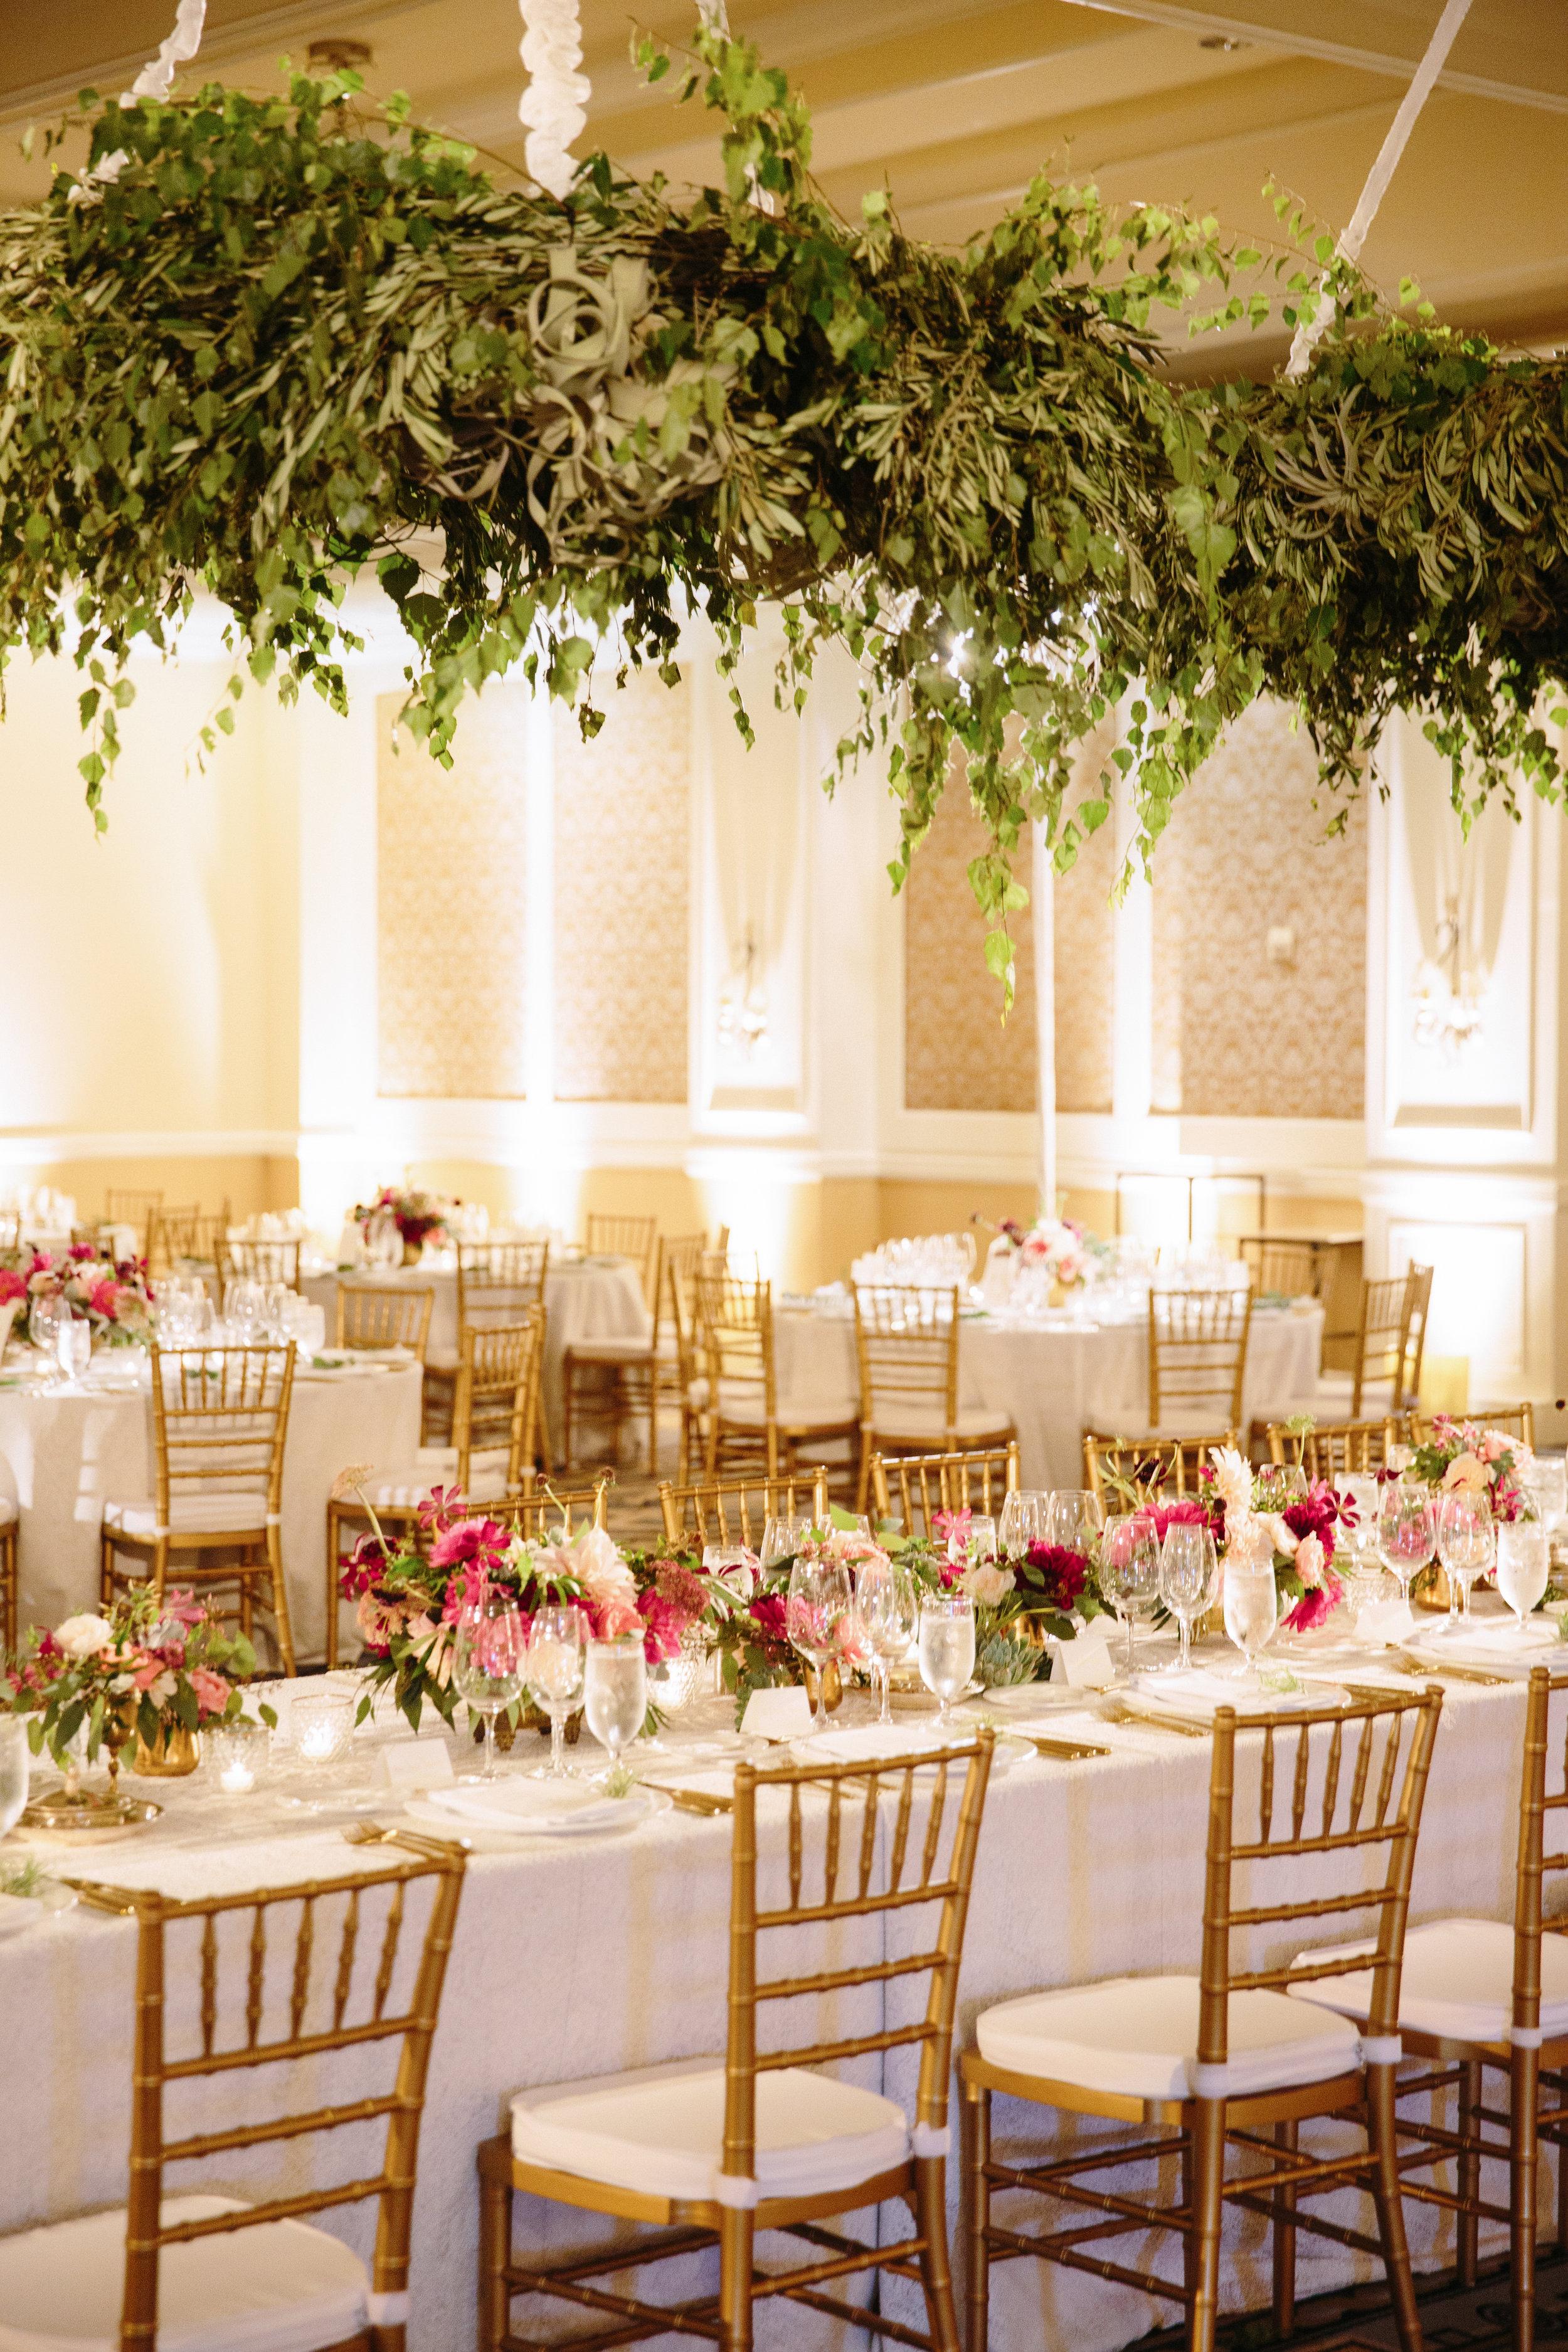 larissa-cleveland-sivanjeremy-wedding-0911-2.jpg